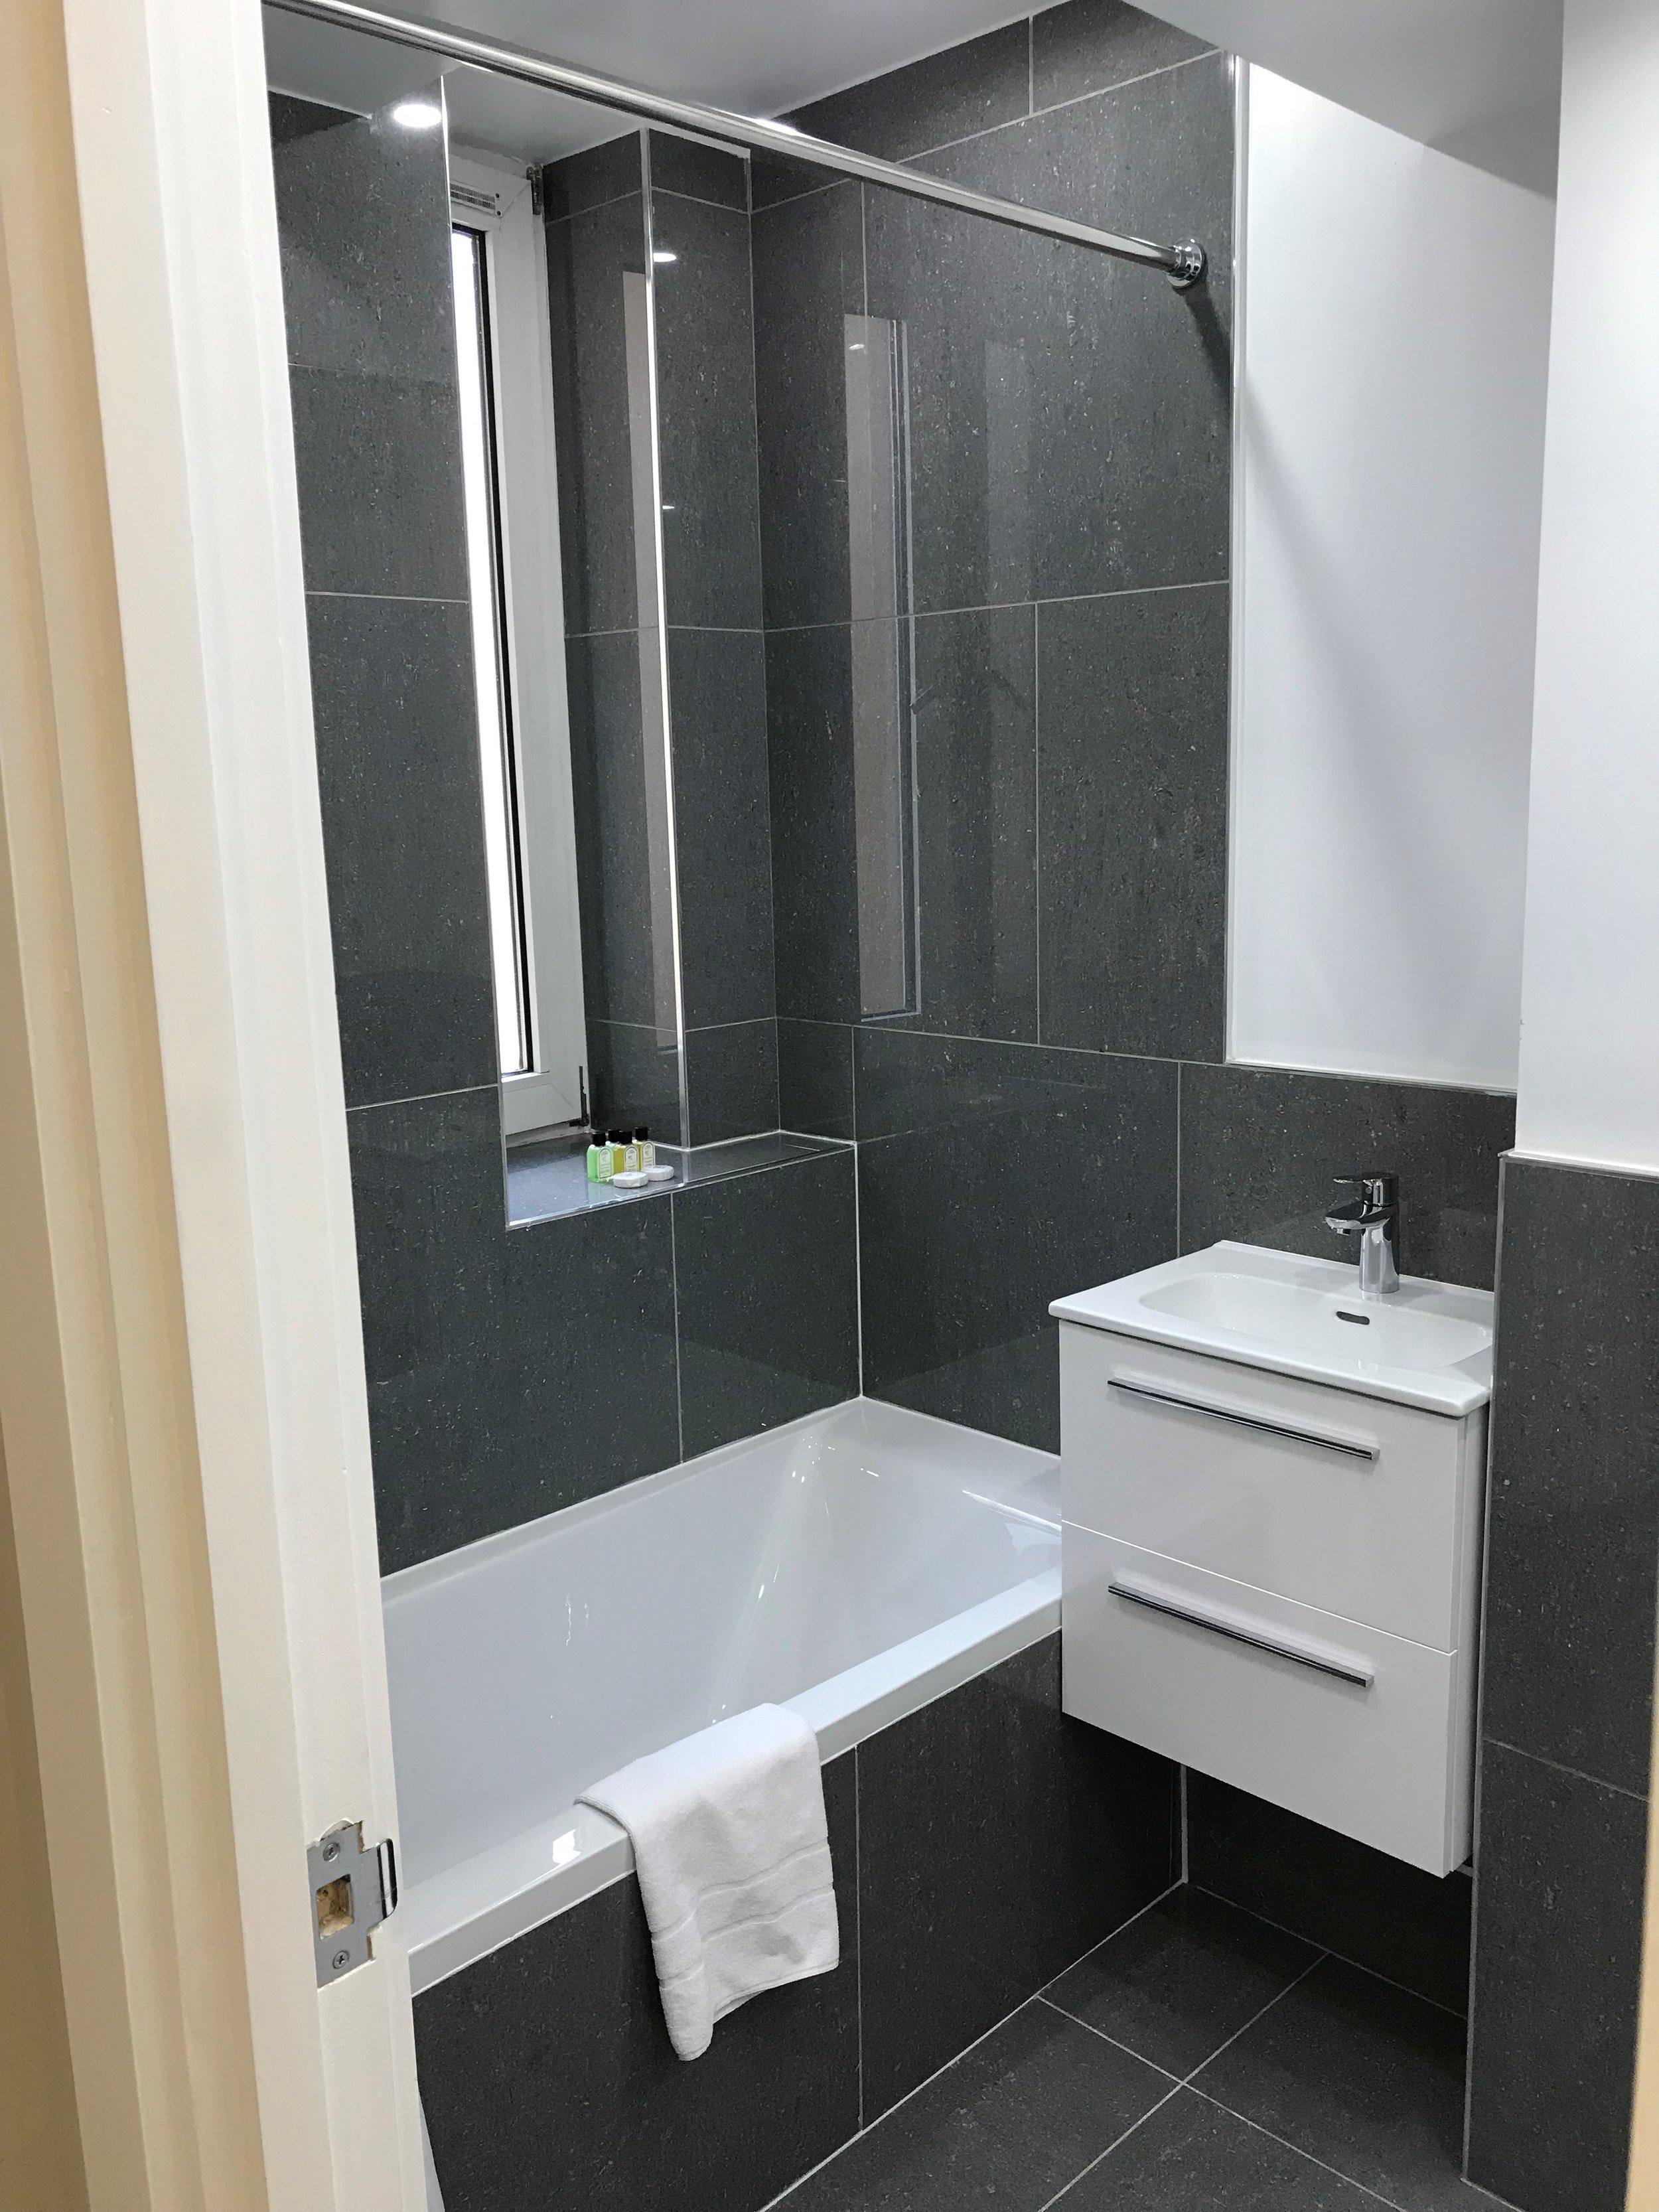 1 Bedroom Apartment - Bathroom Sample.jpg